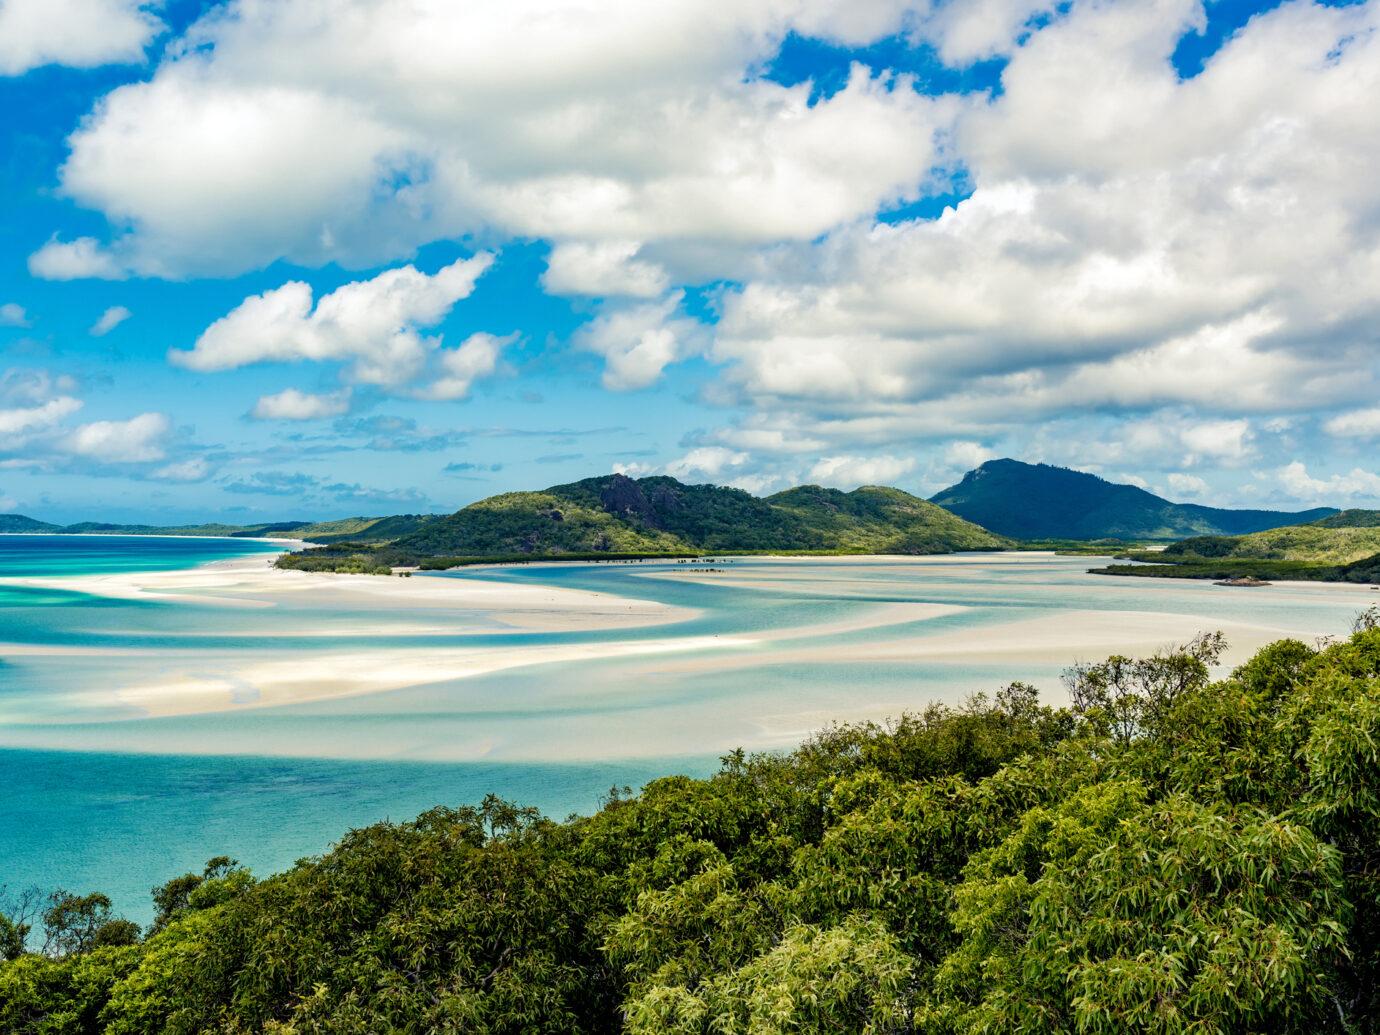 Airlie Beach of the Whitsundays, Australia